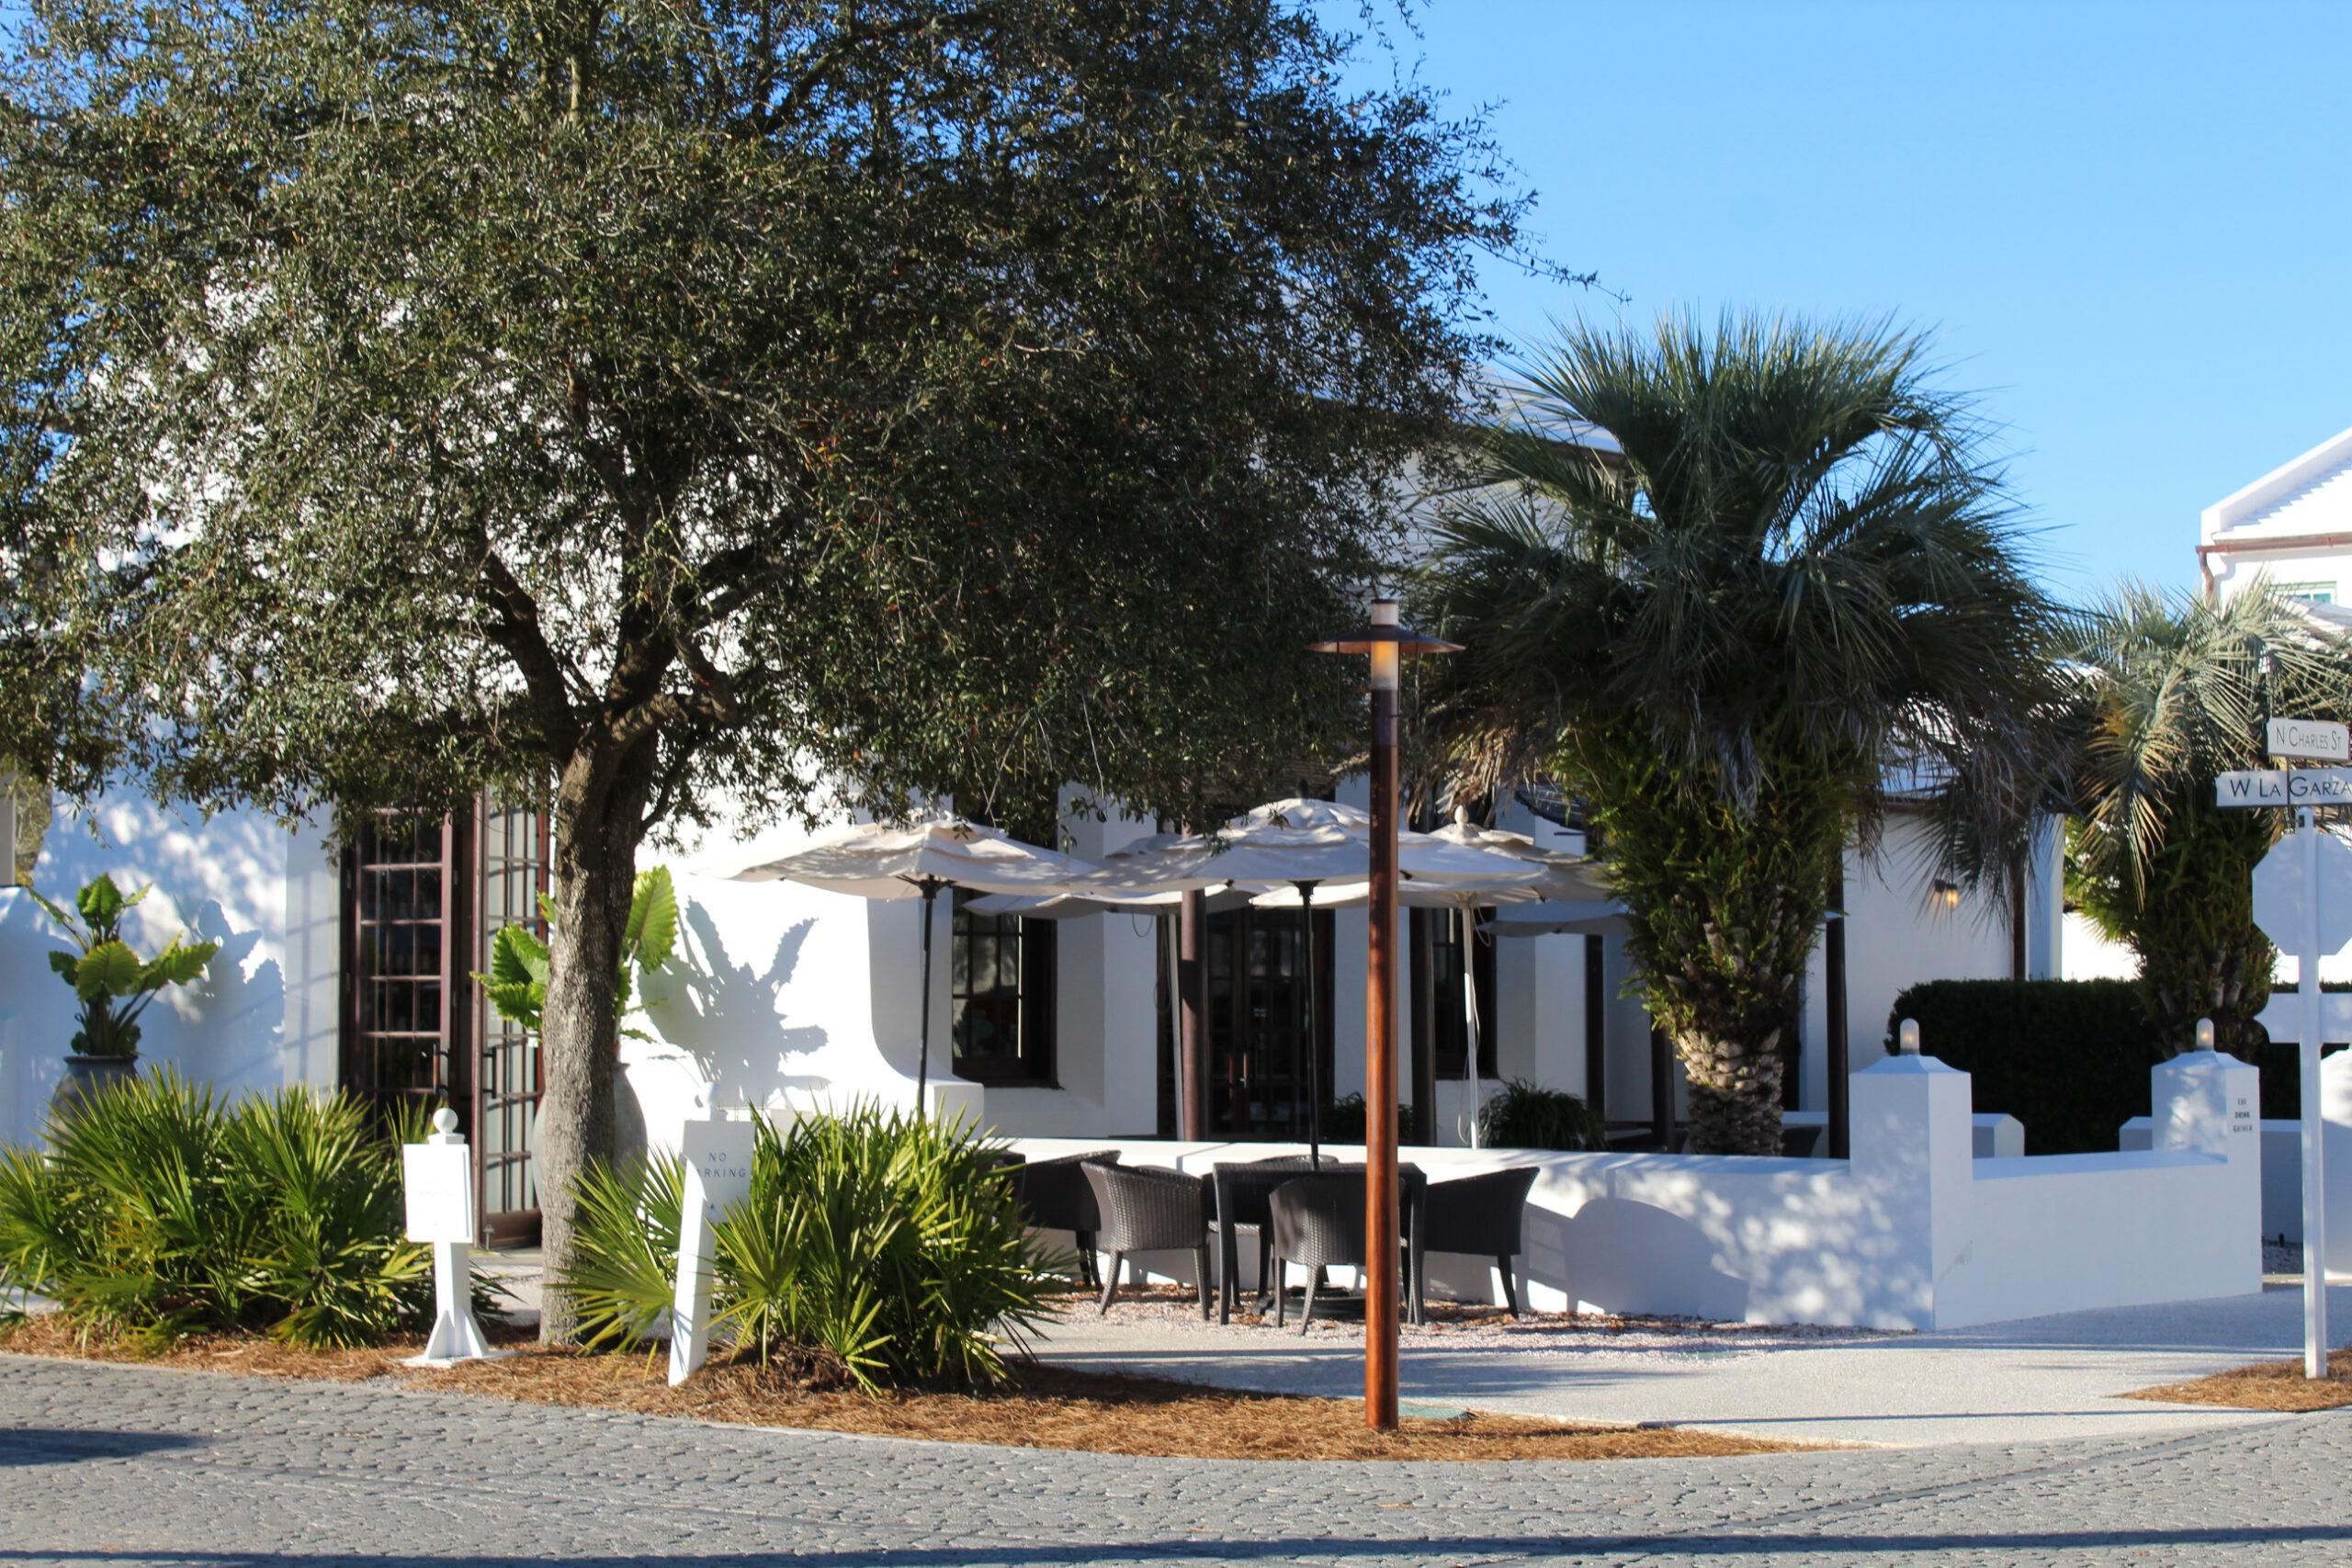 Alys Beach Florida Midlife Snowbird